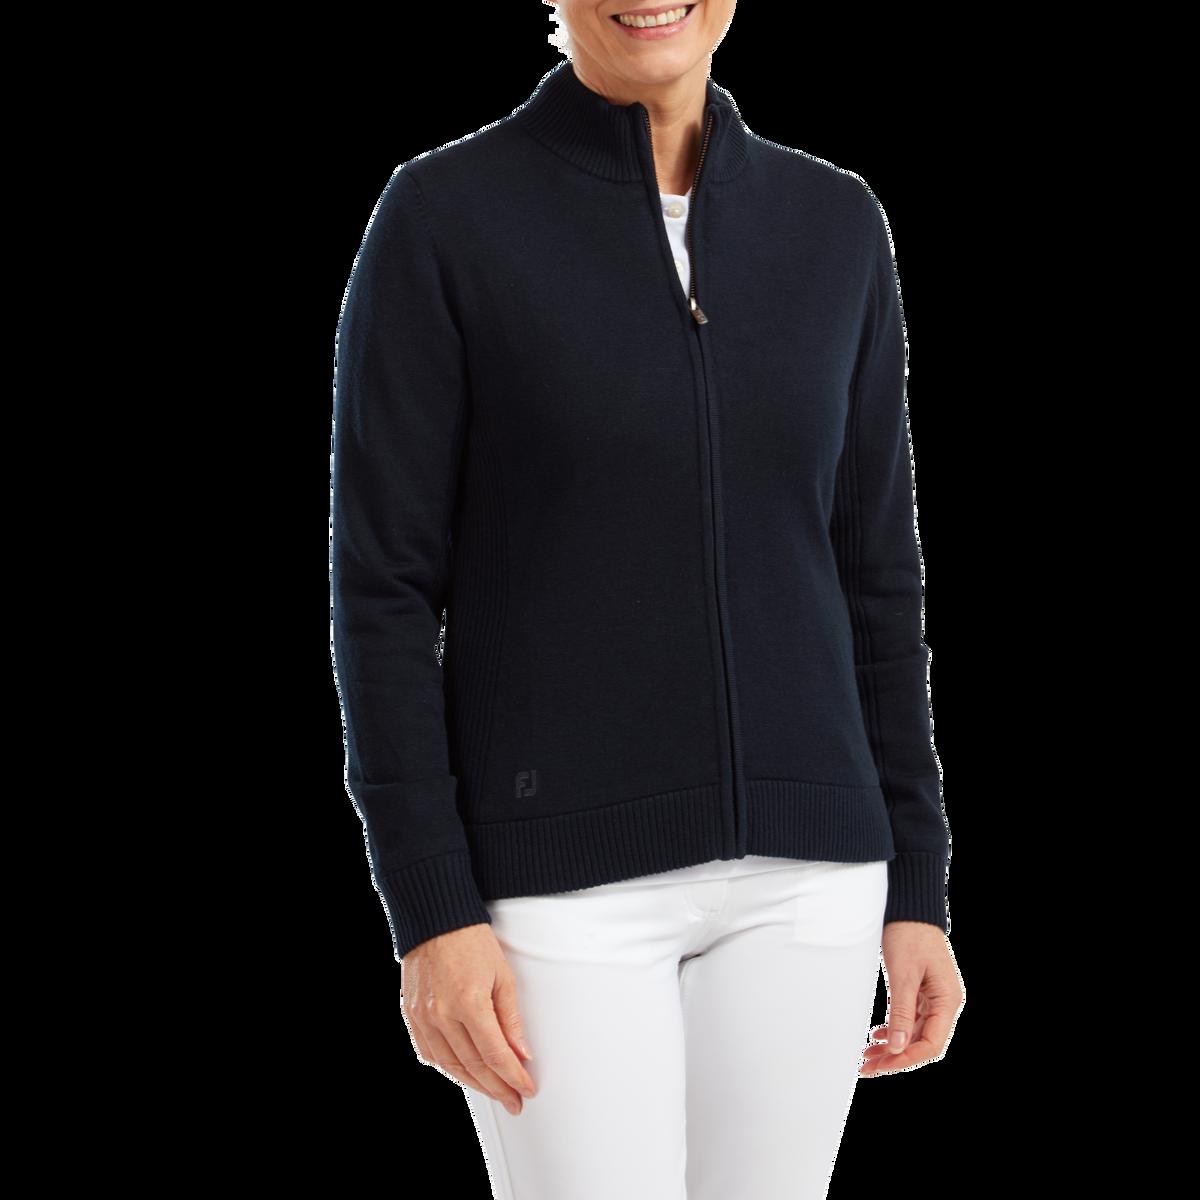 Women's Full-Zip Lined Wool Blend Pullover